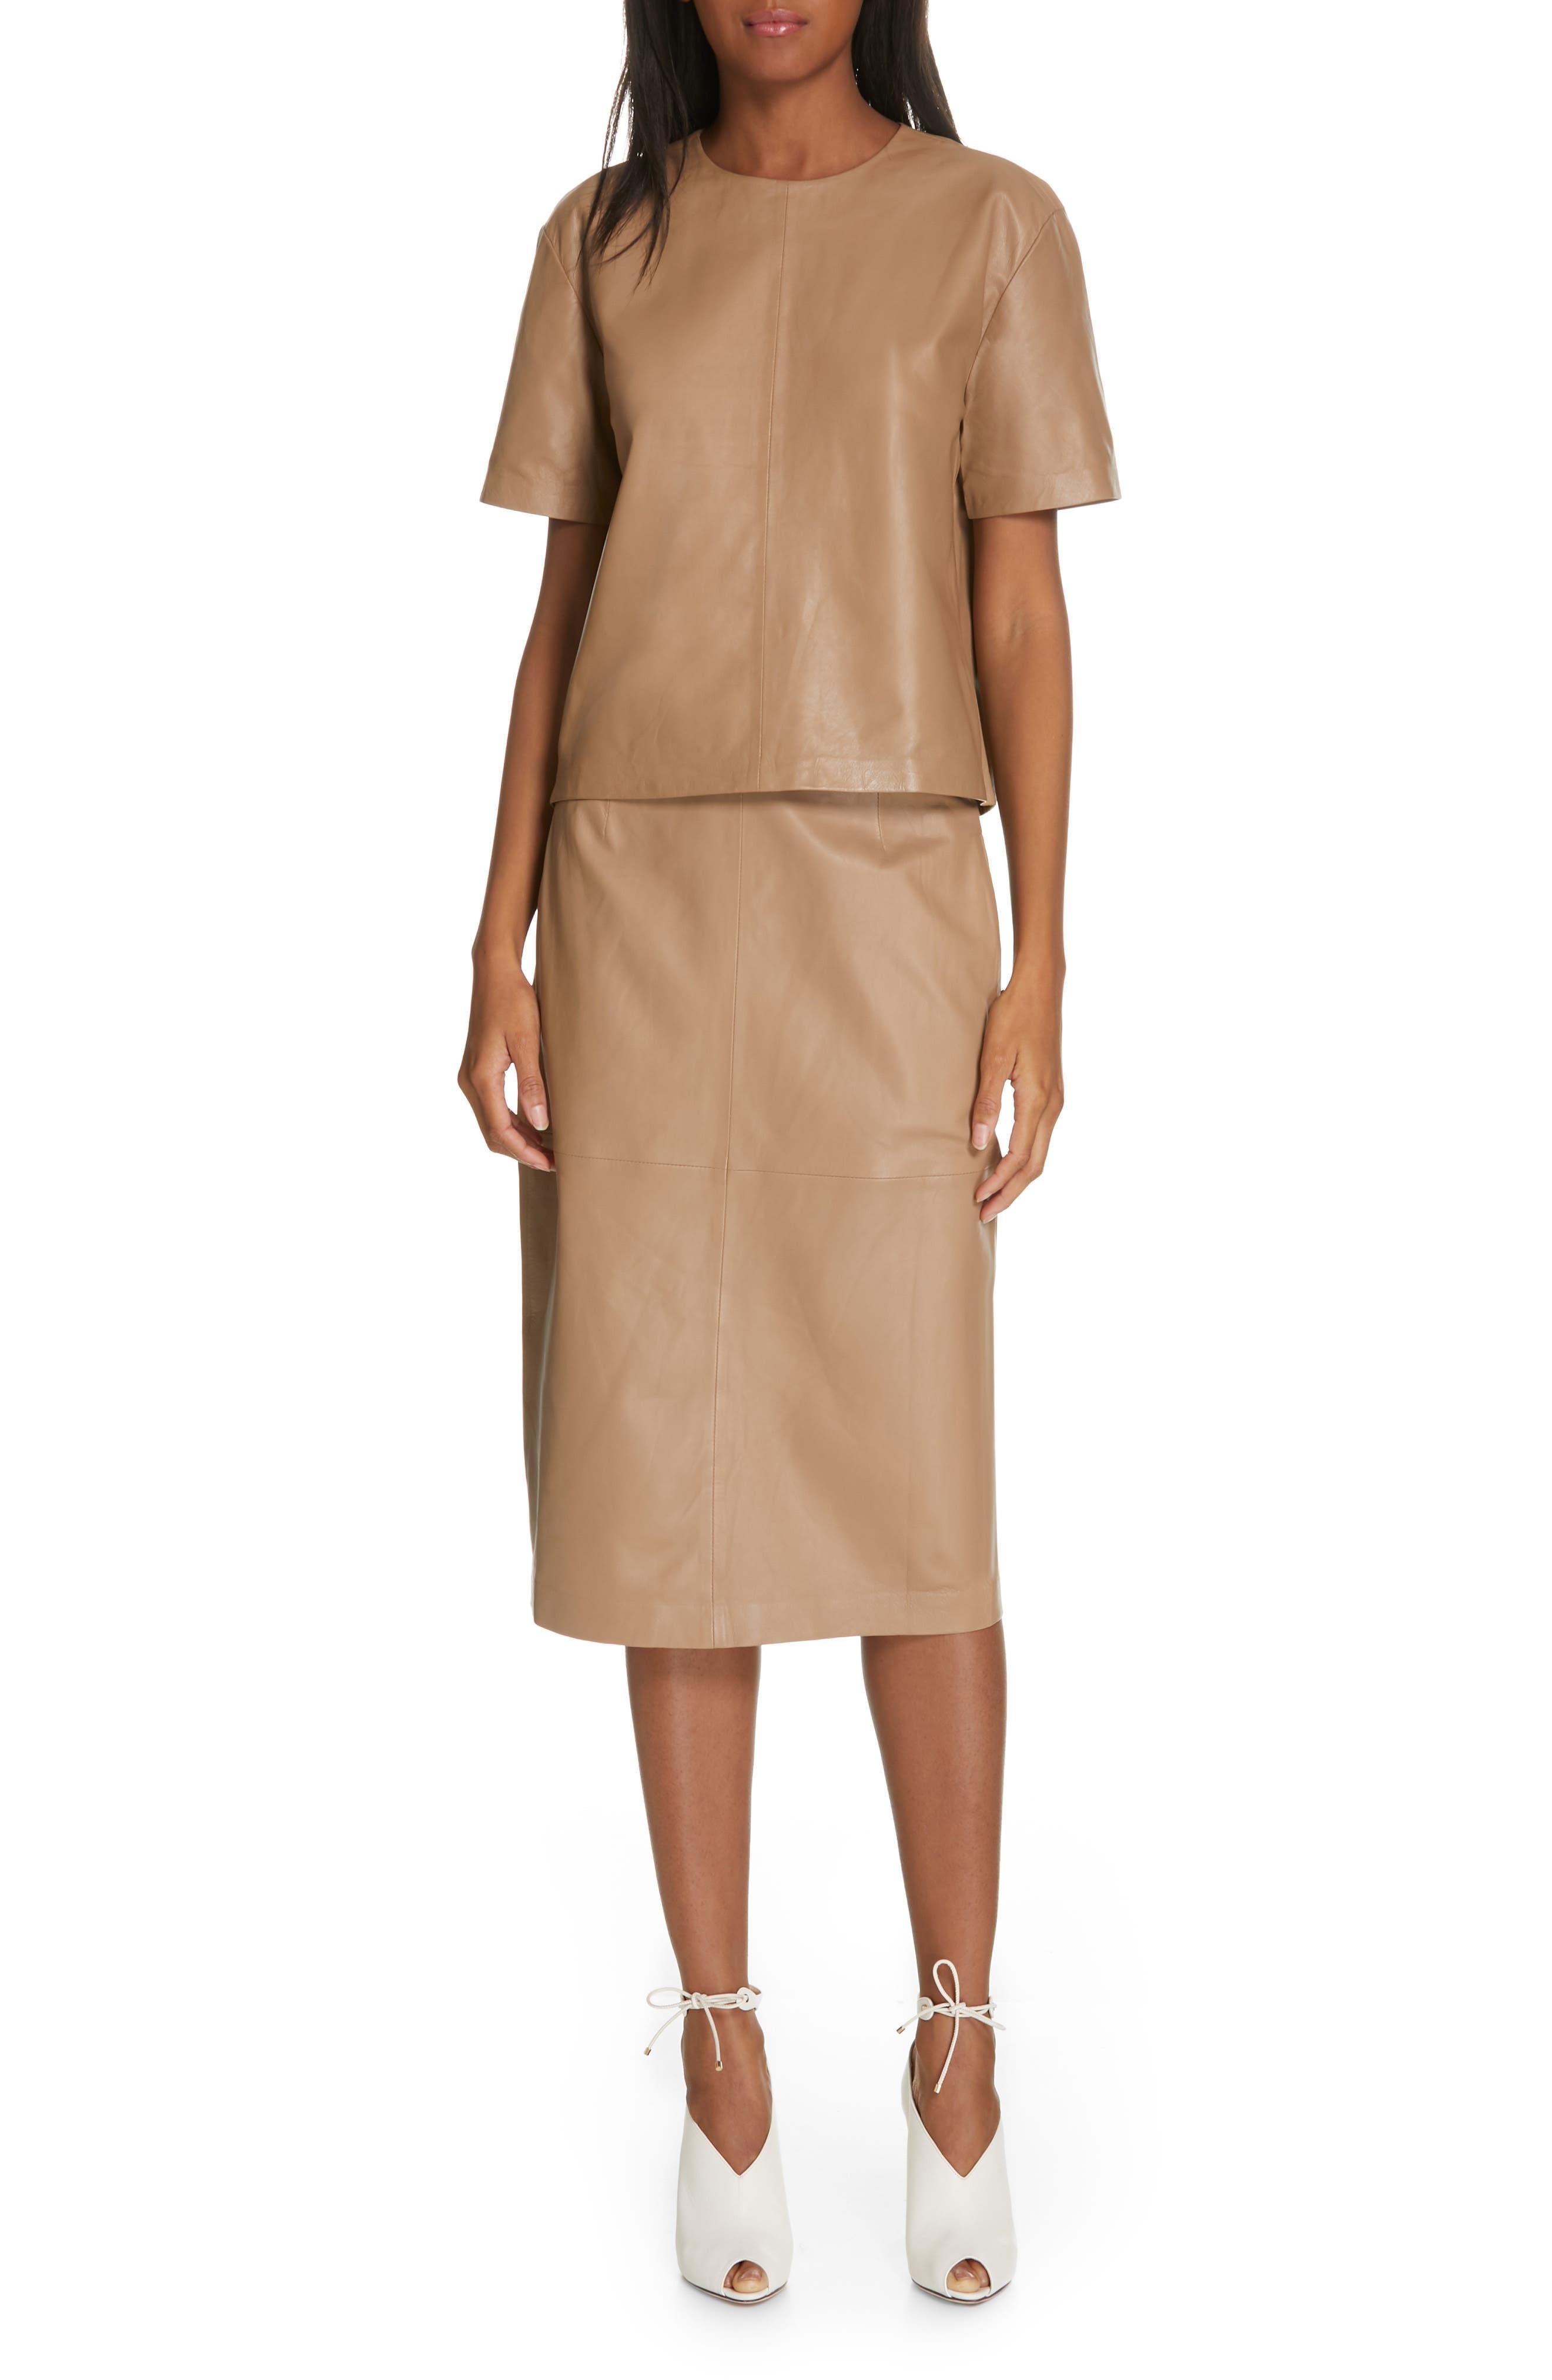 Alouetta Leather Skirt,                             Alternate thumbnail 7, color,                             BOIS